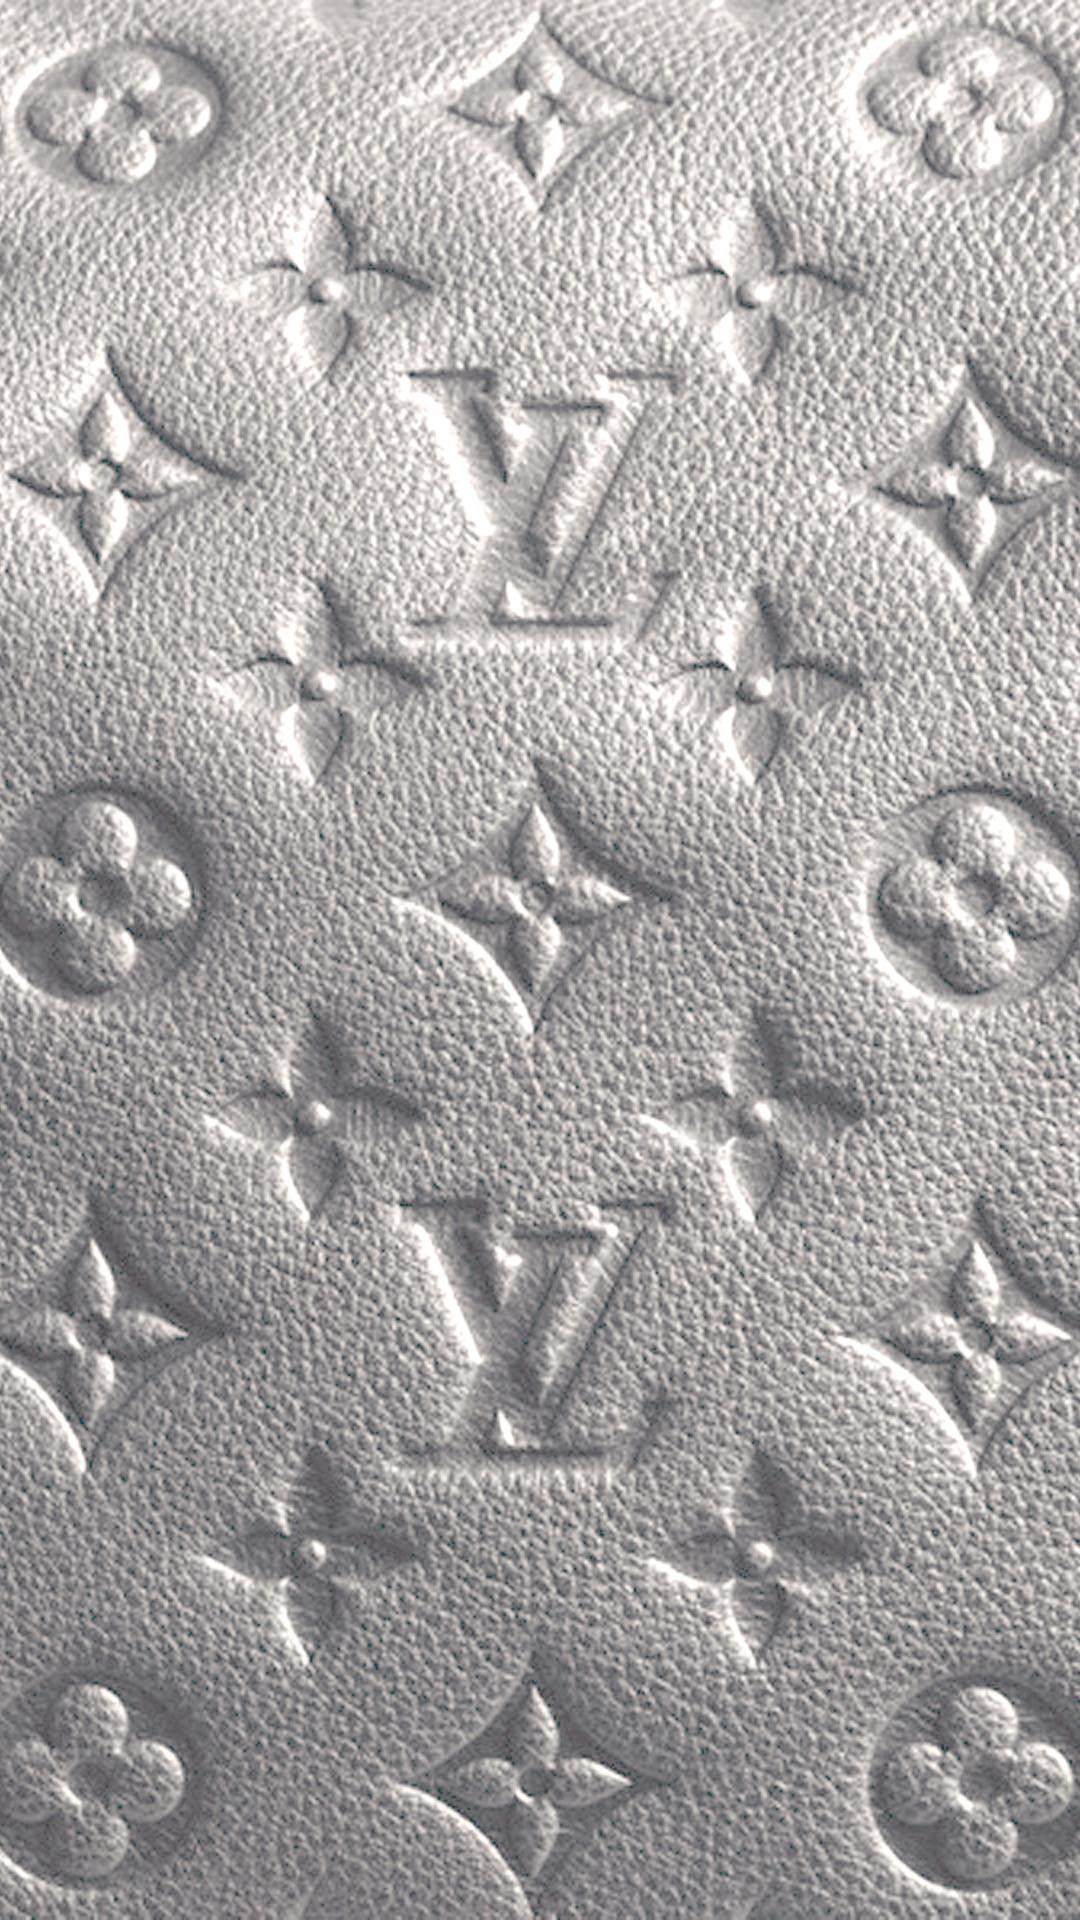 Iphone Lv Wallpaper 4k 1080x1920